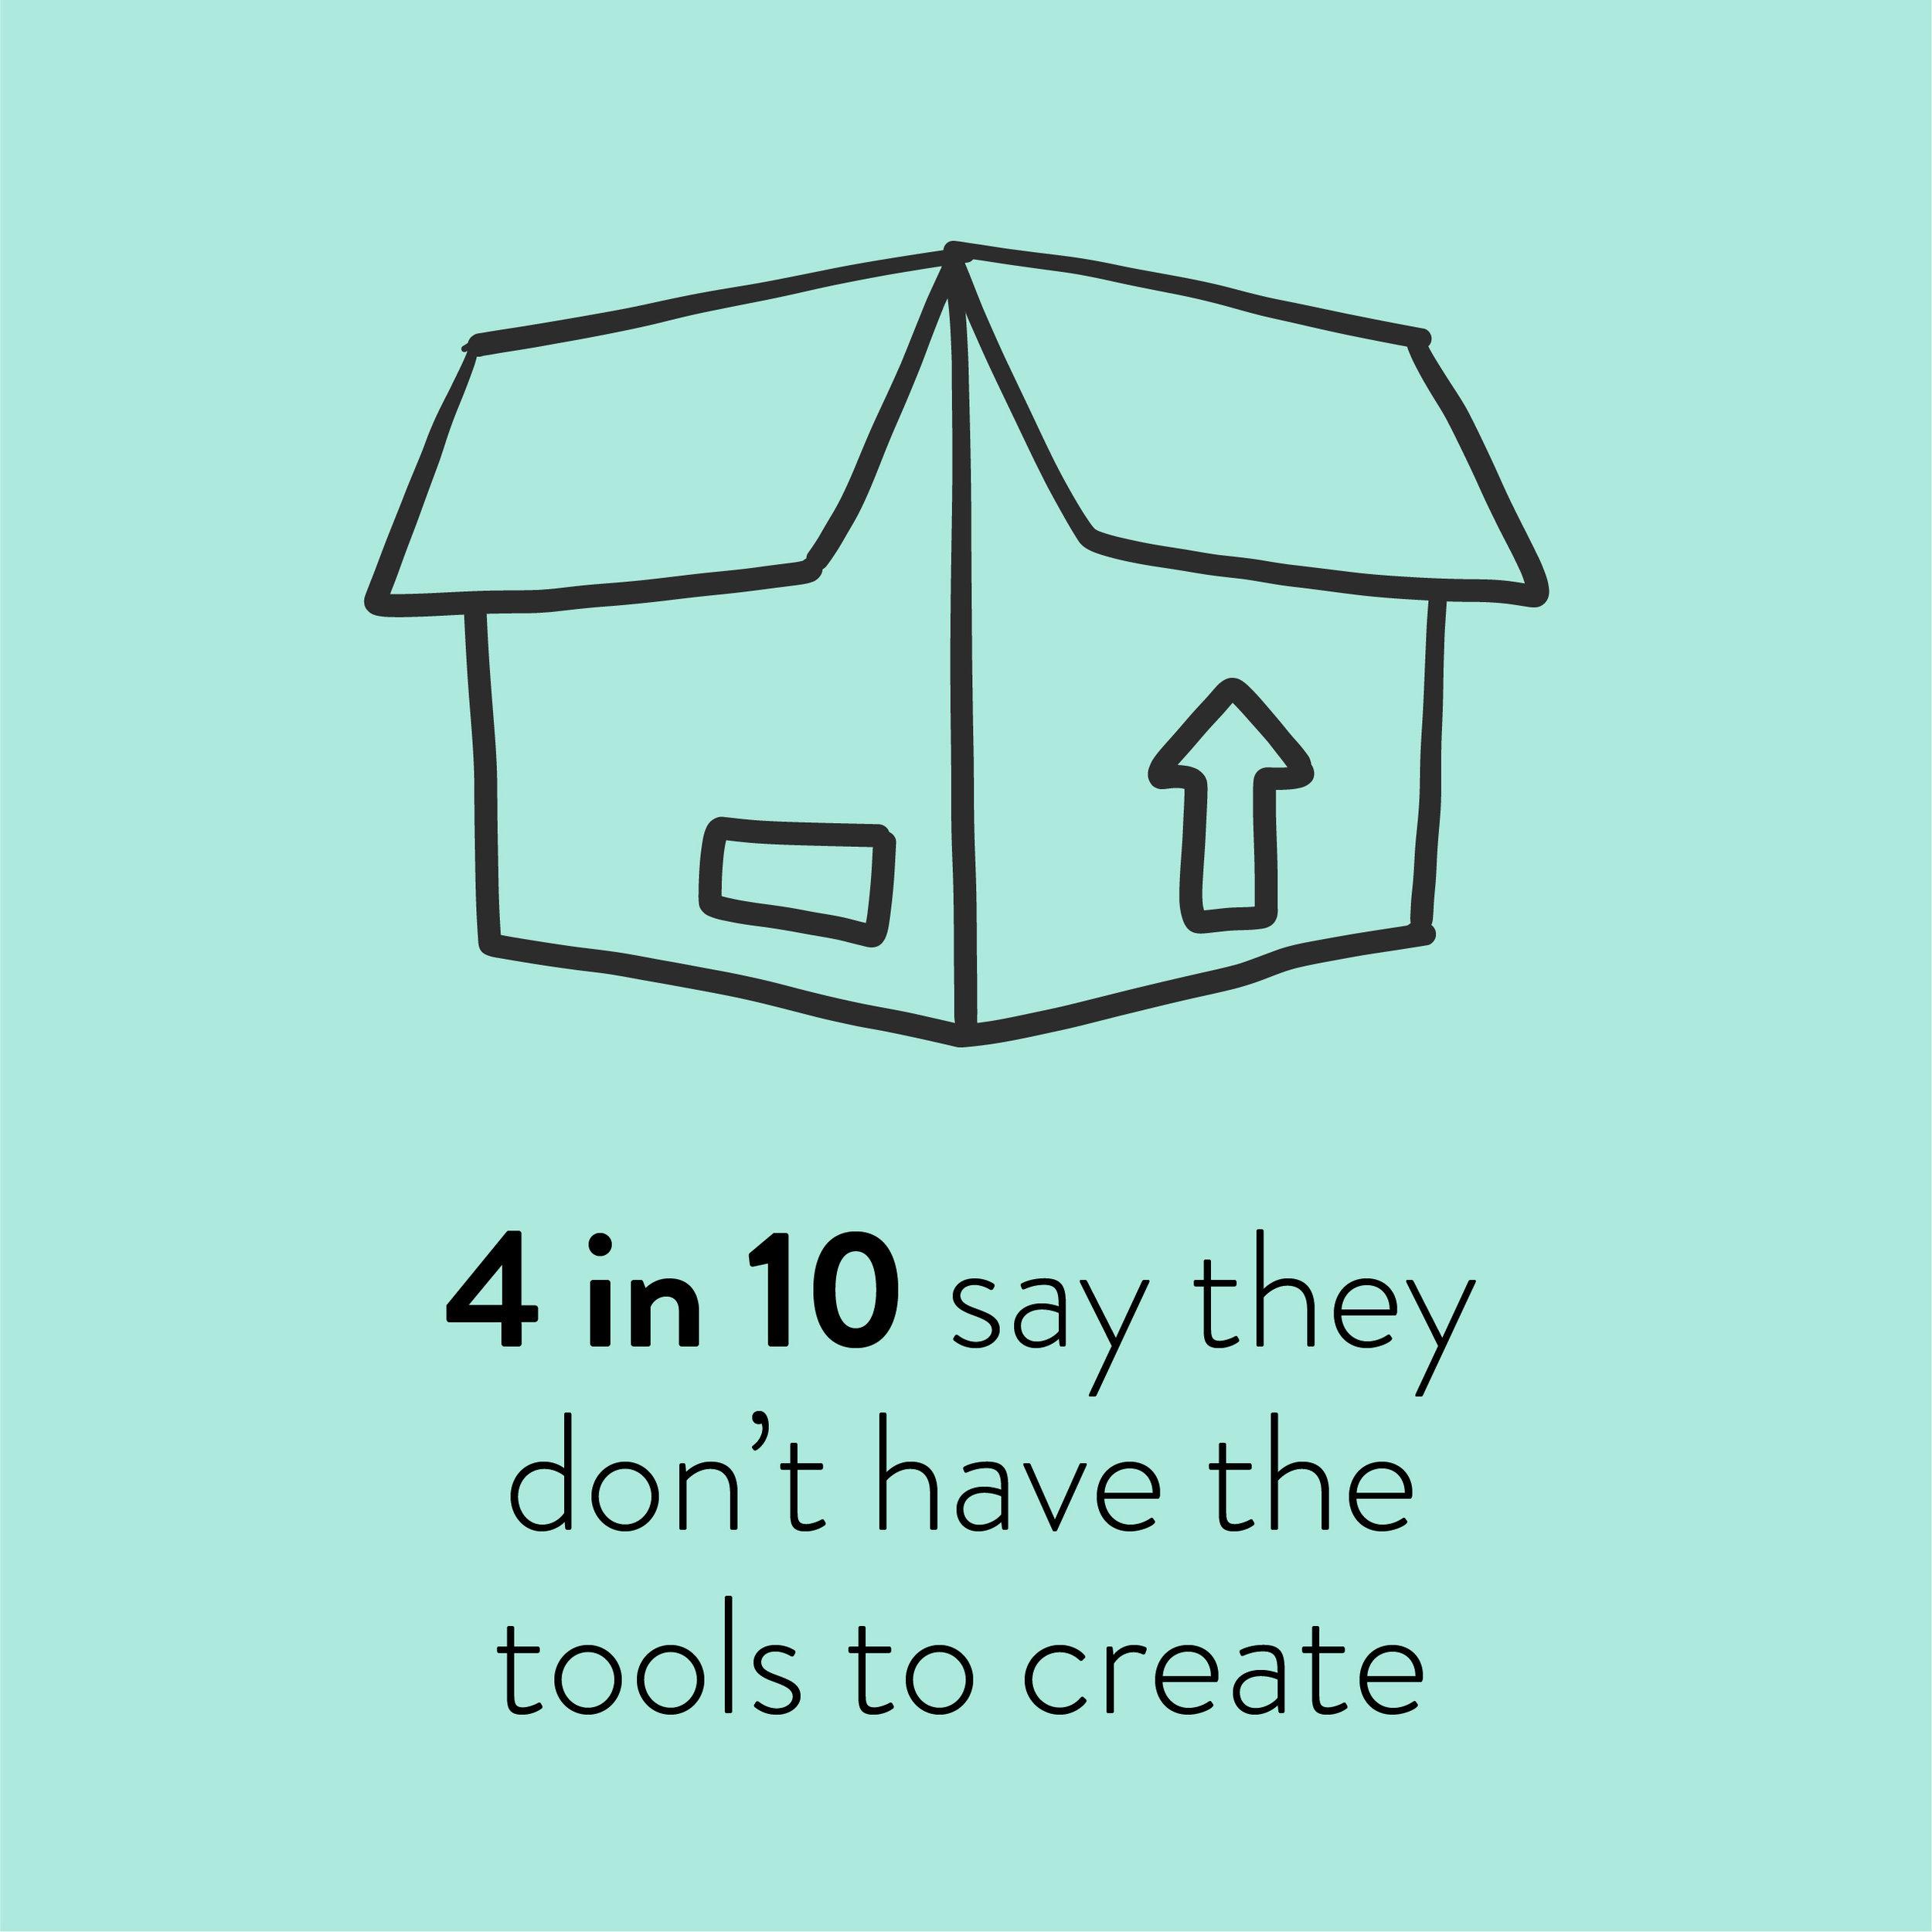 Creativity and tools